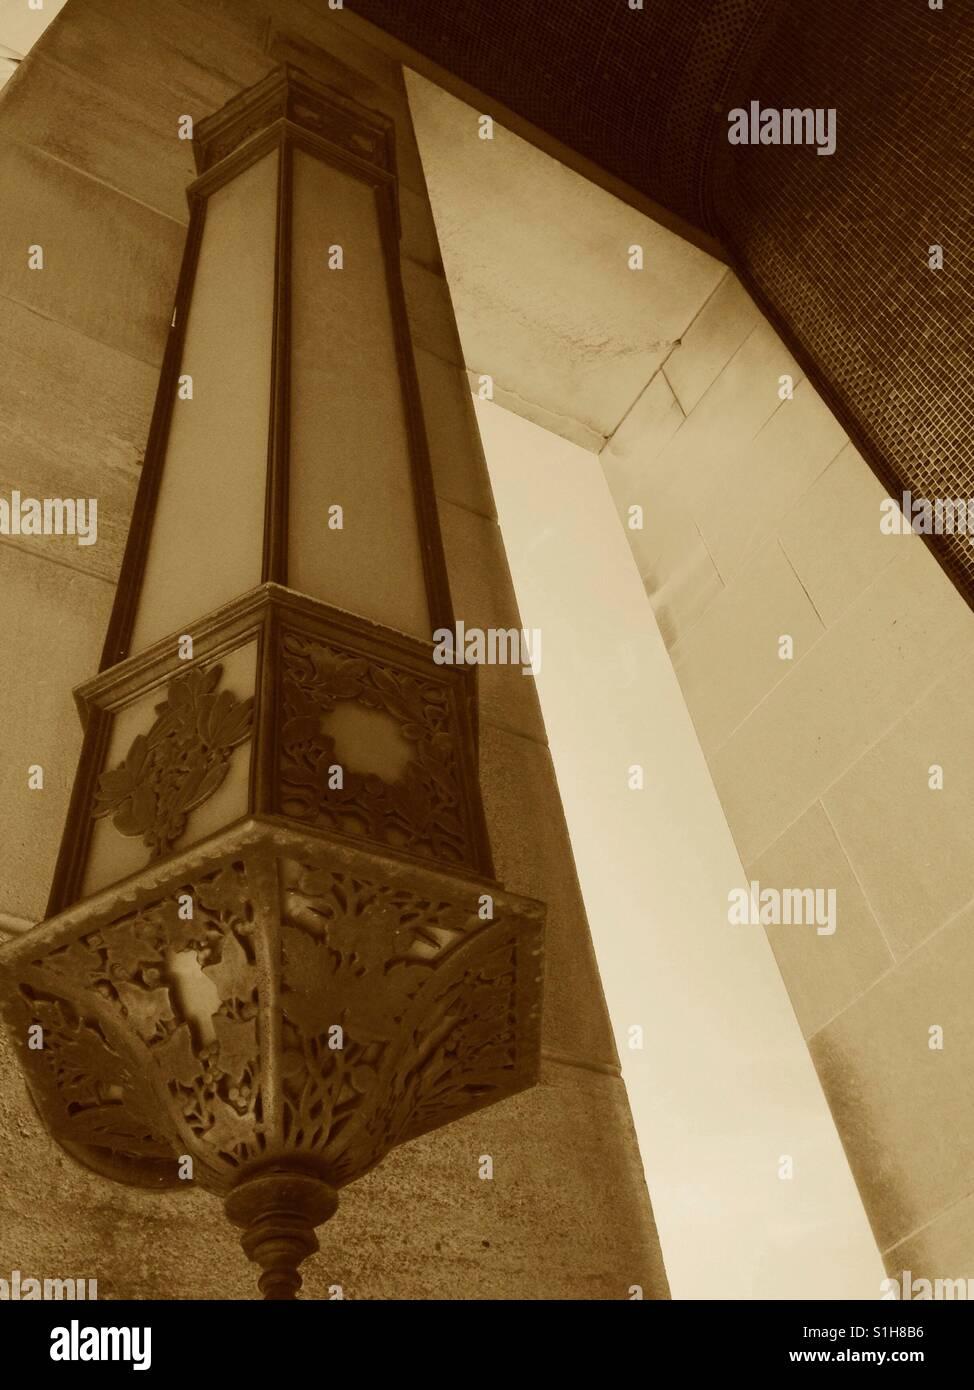 Light fixture and doorways at WWI memorial, Kansas City. Sepia filter applied. - Stock Image